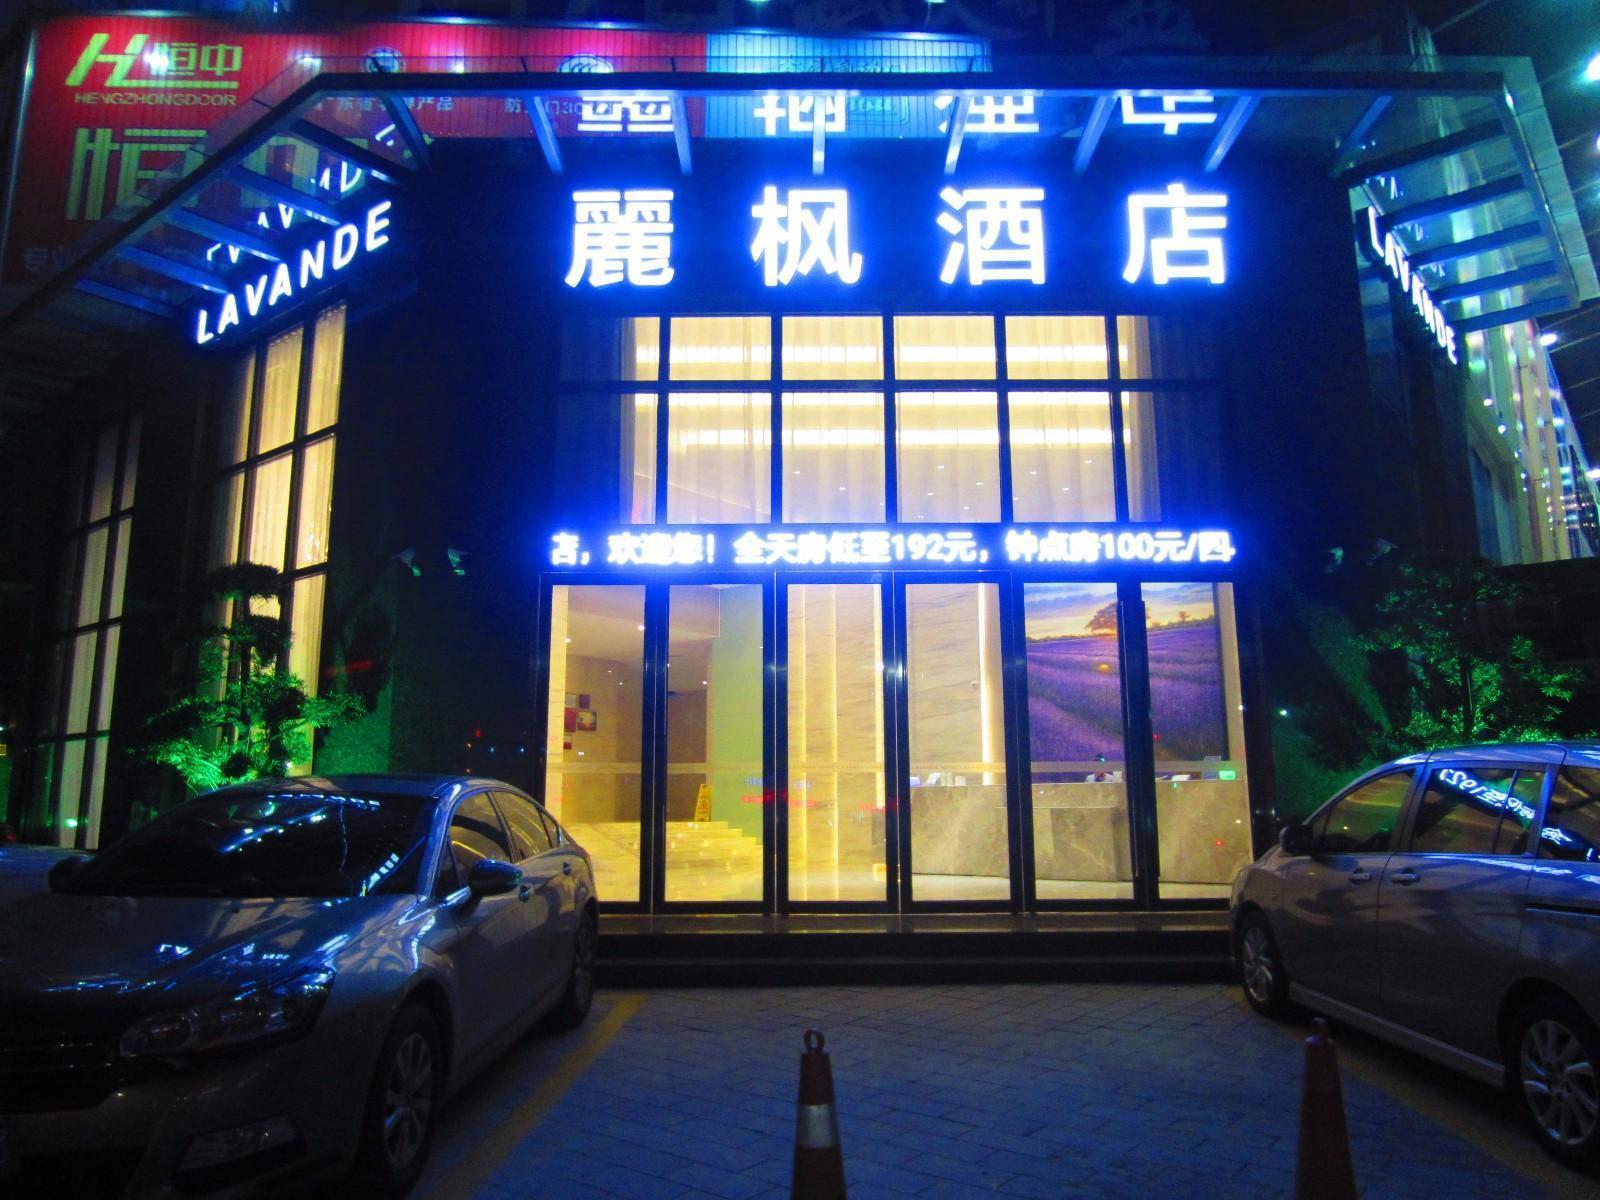 Lavande Hotel Lianjiang Avenue Telecom Building Reviews